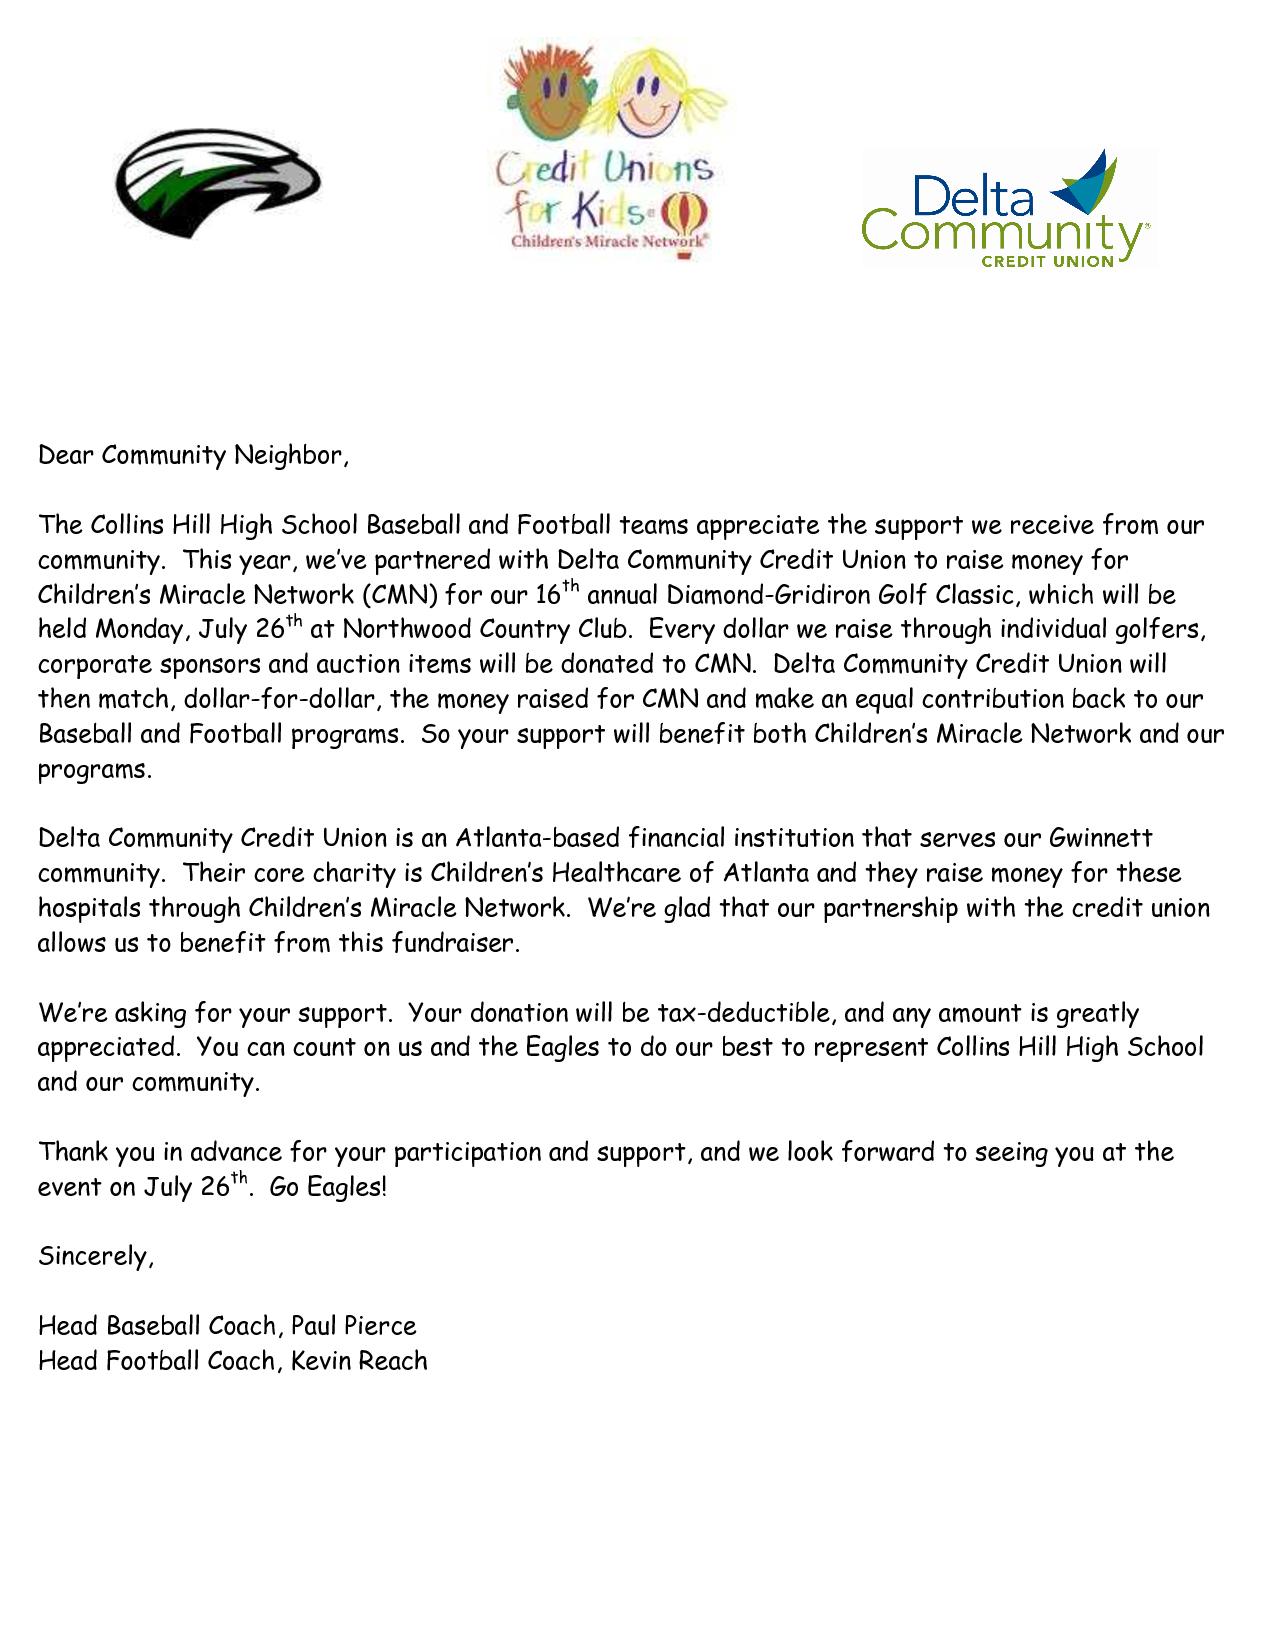 Golf Sponsorship Proposal Template  Camisonline Regarding Golf Tournament Sponsorship Agreement Template